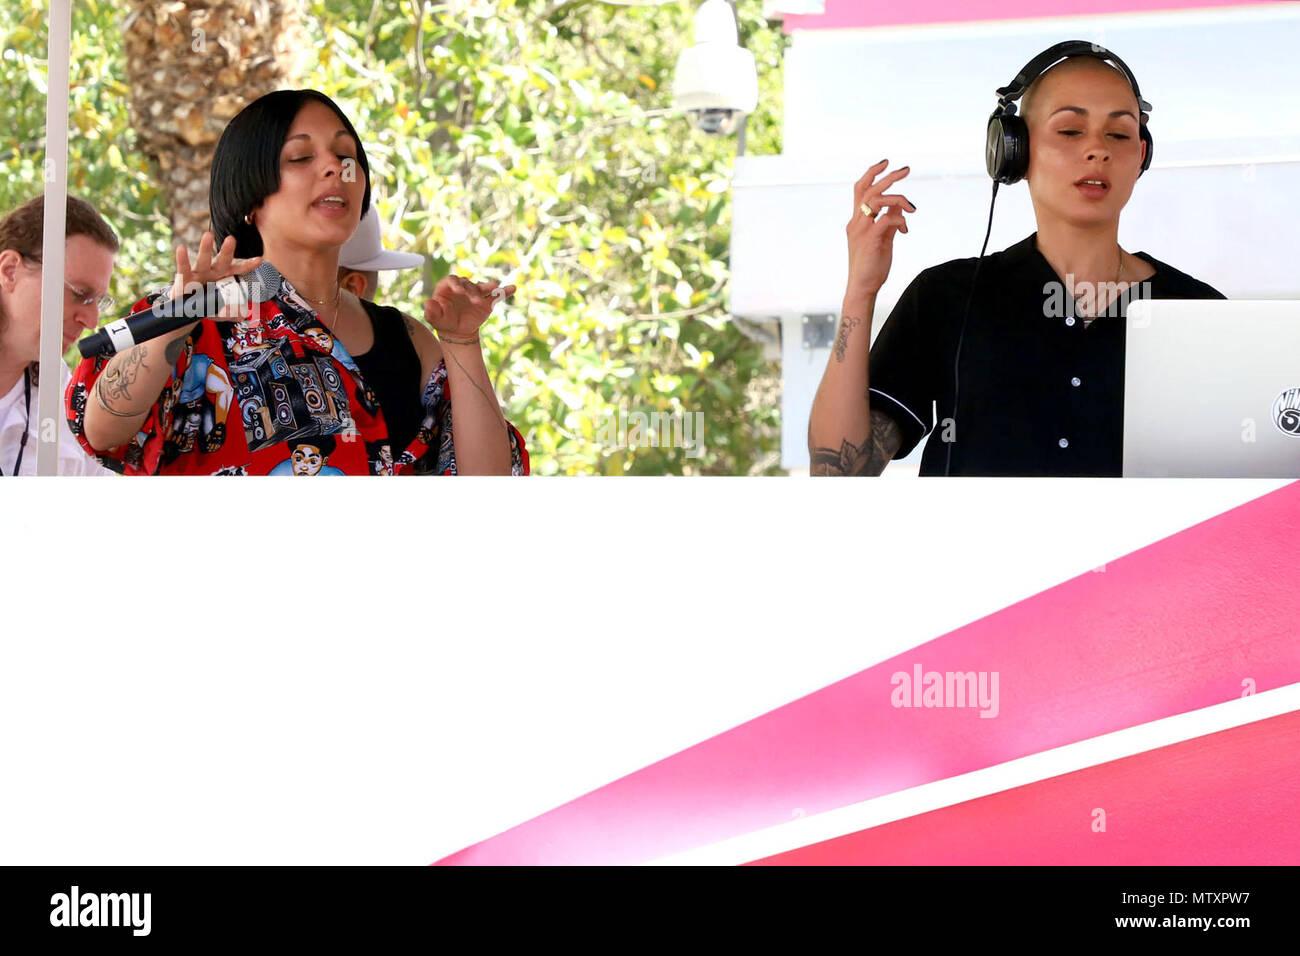 Nina Sky during their DJ set at Go Pool inside Flamingo